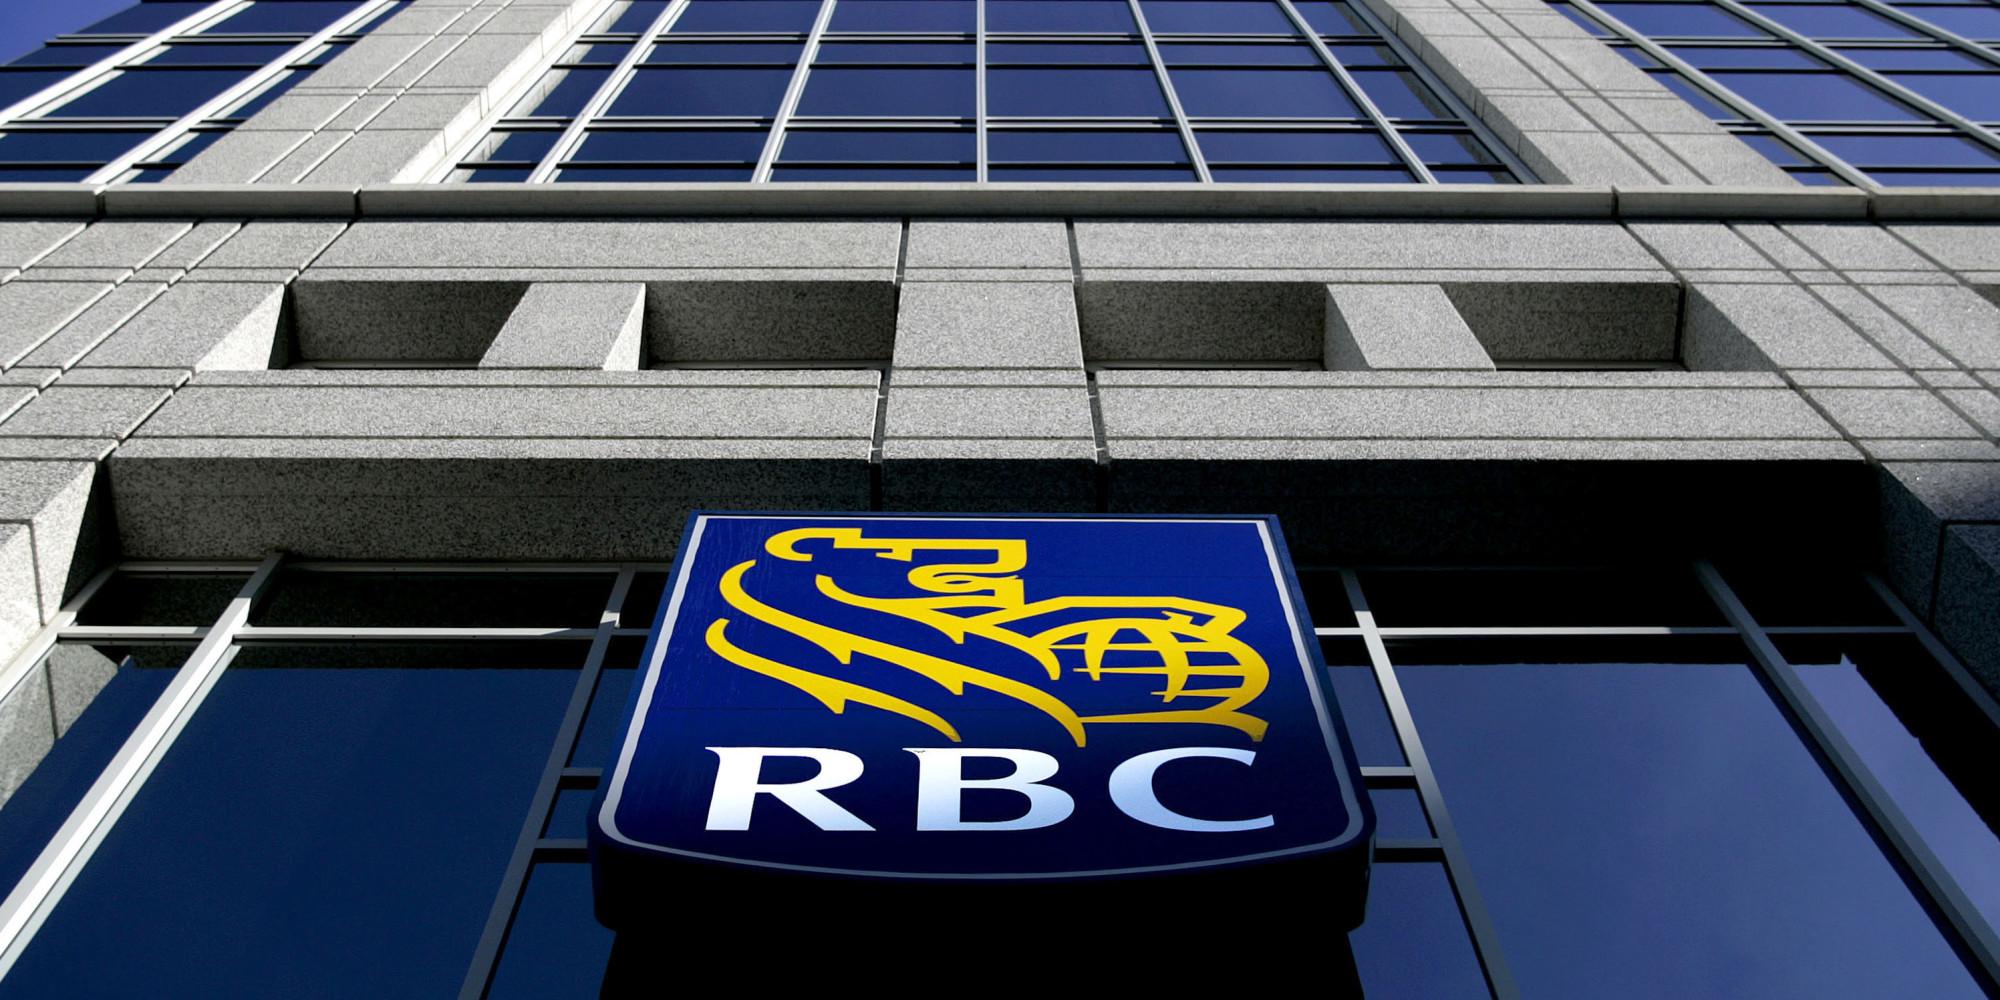 Resultado de imagem para royal bank of canada